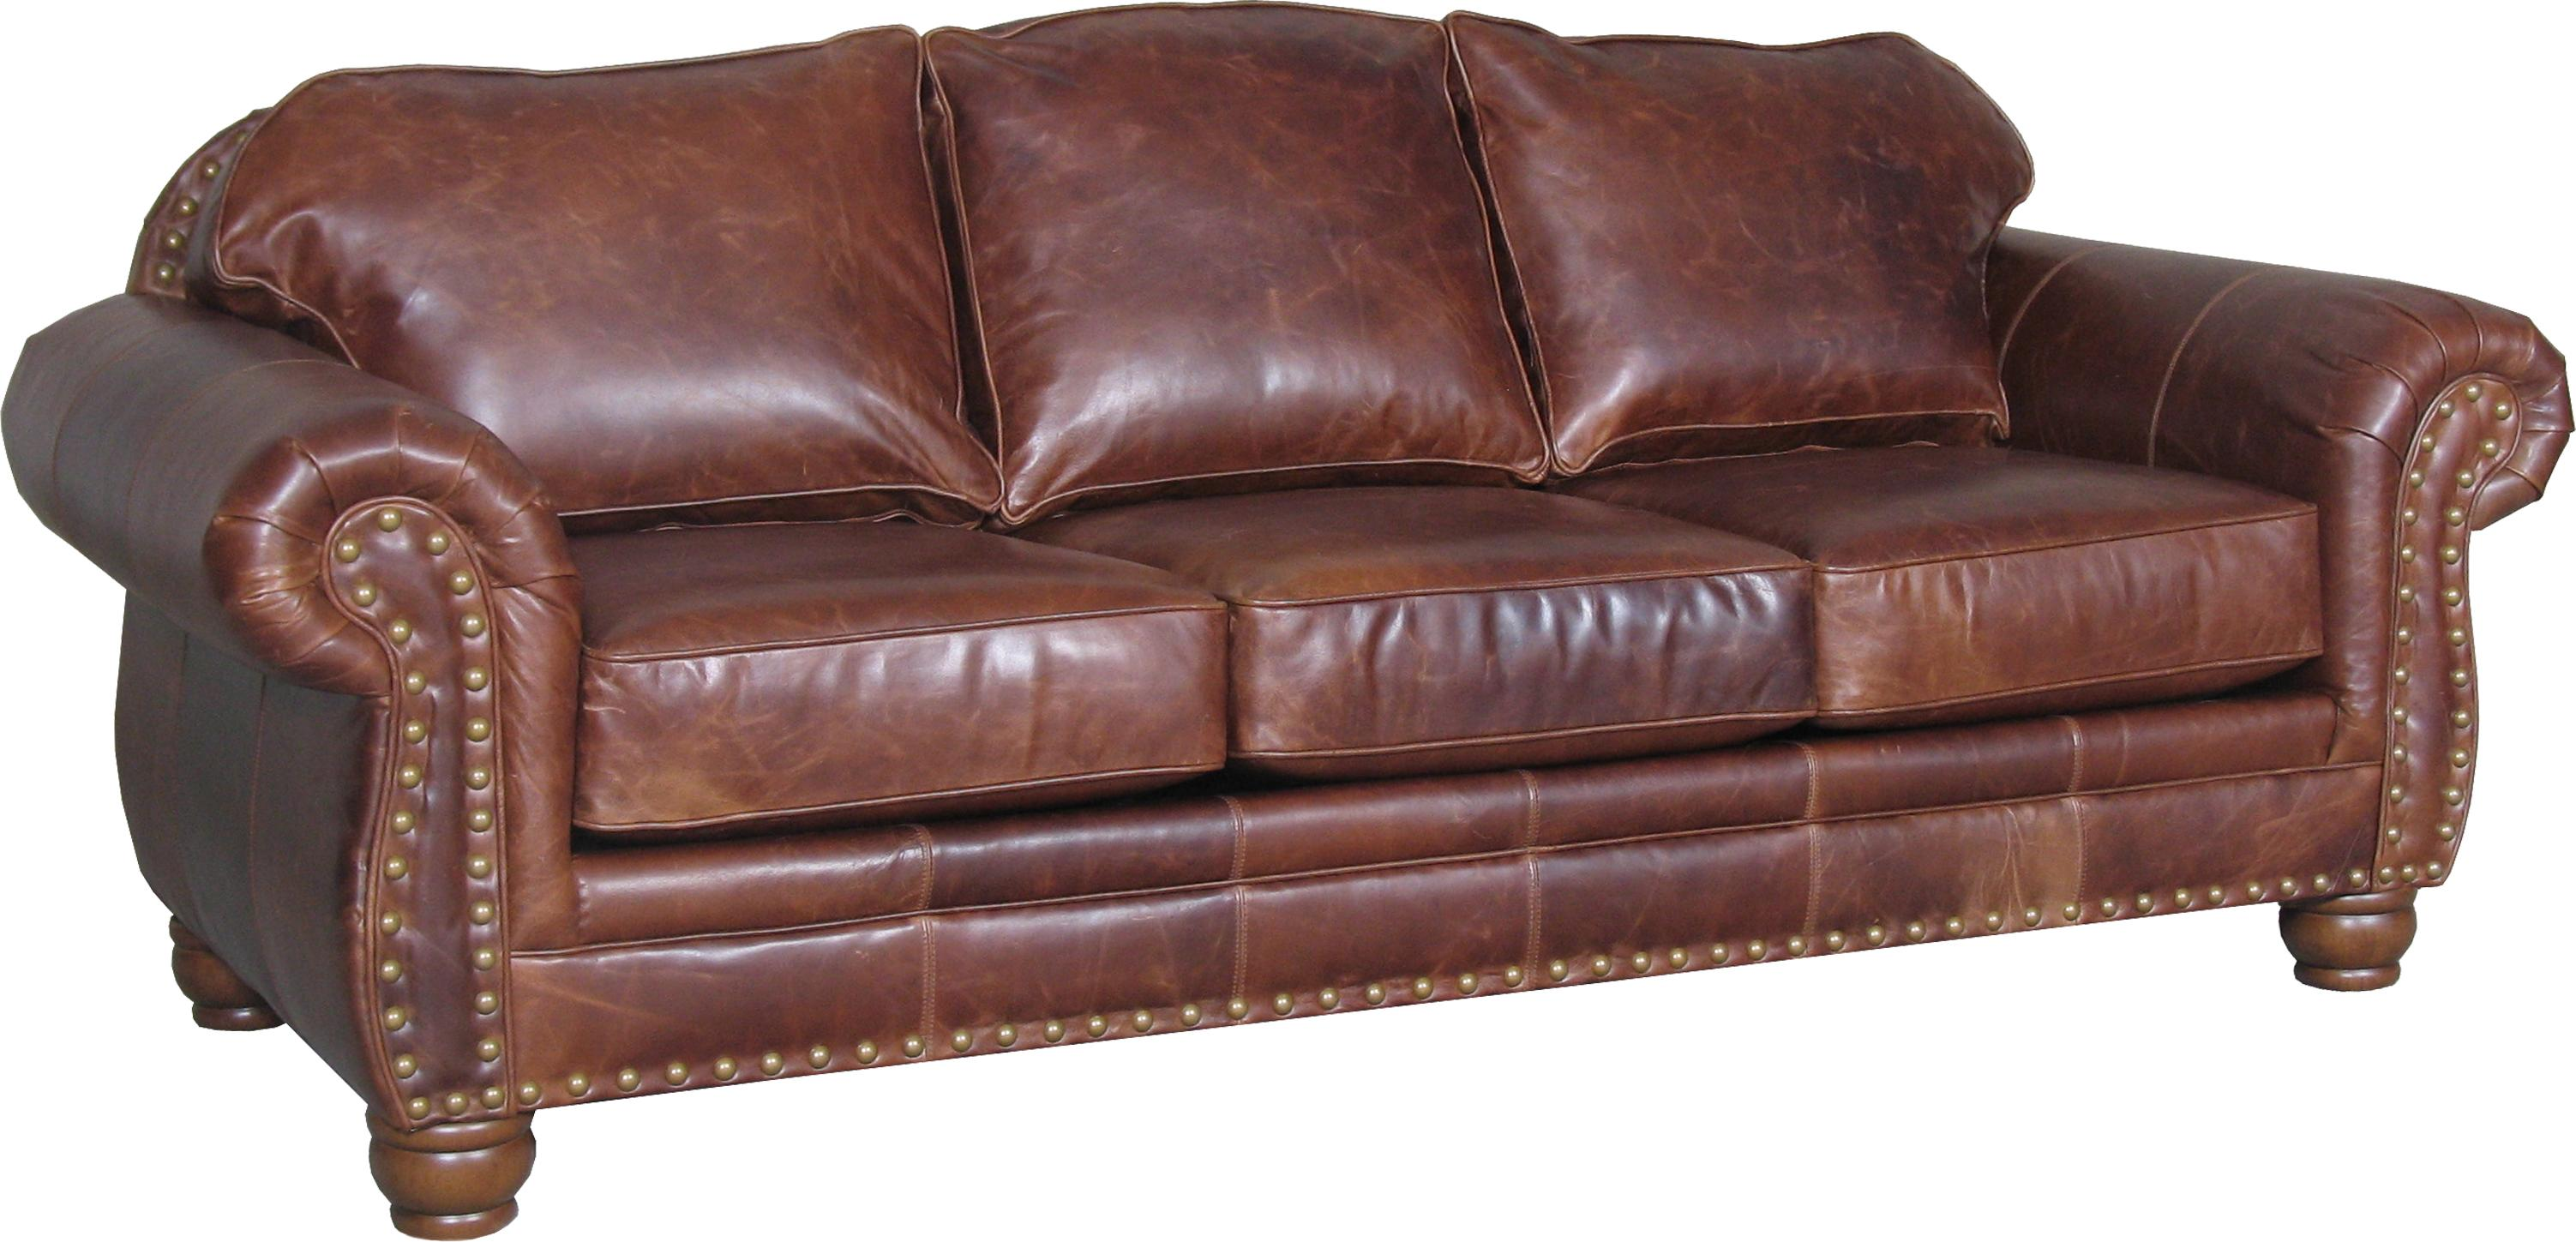 3180 Sofa by Mayo at Story & Lee Furniture